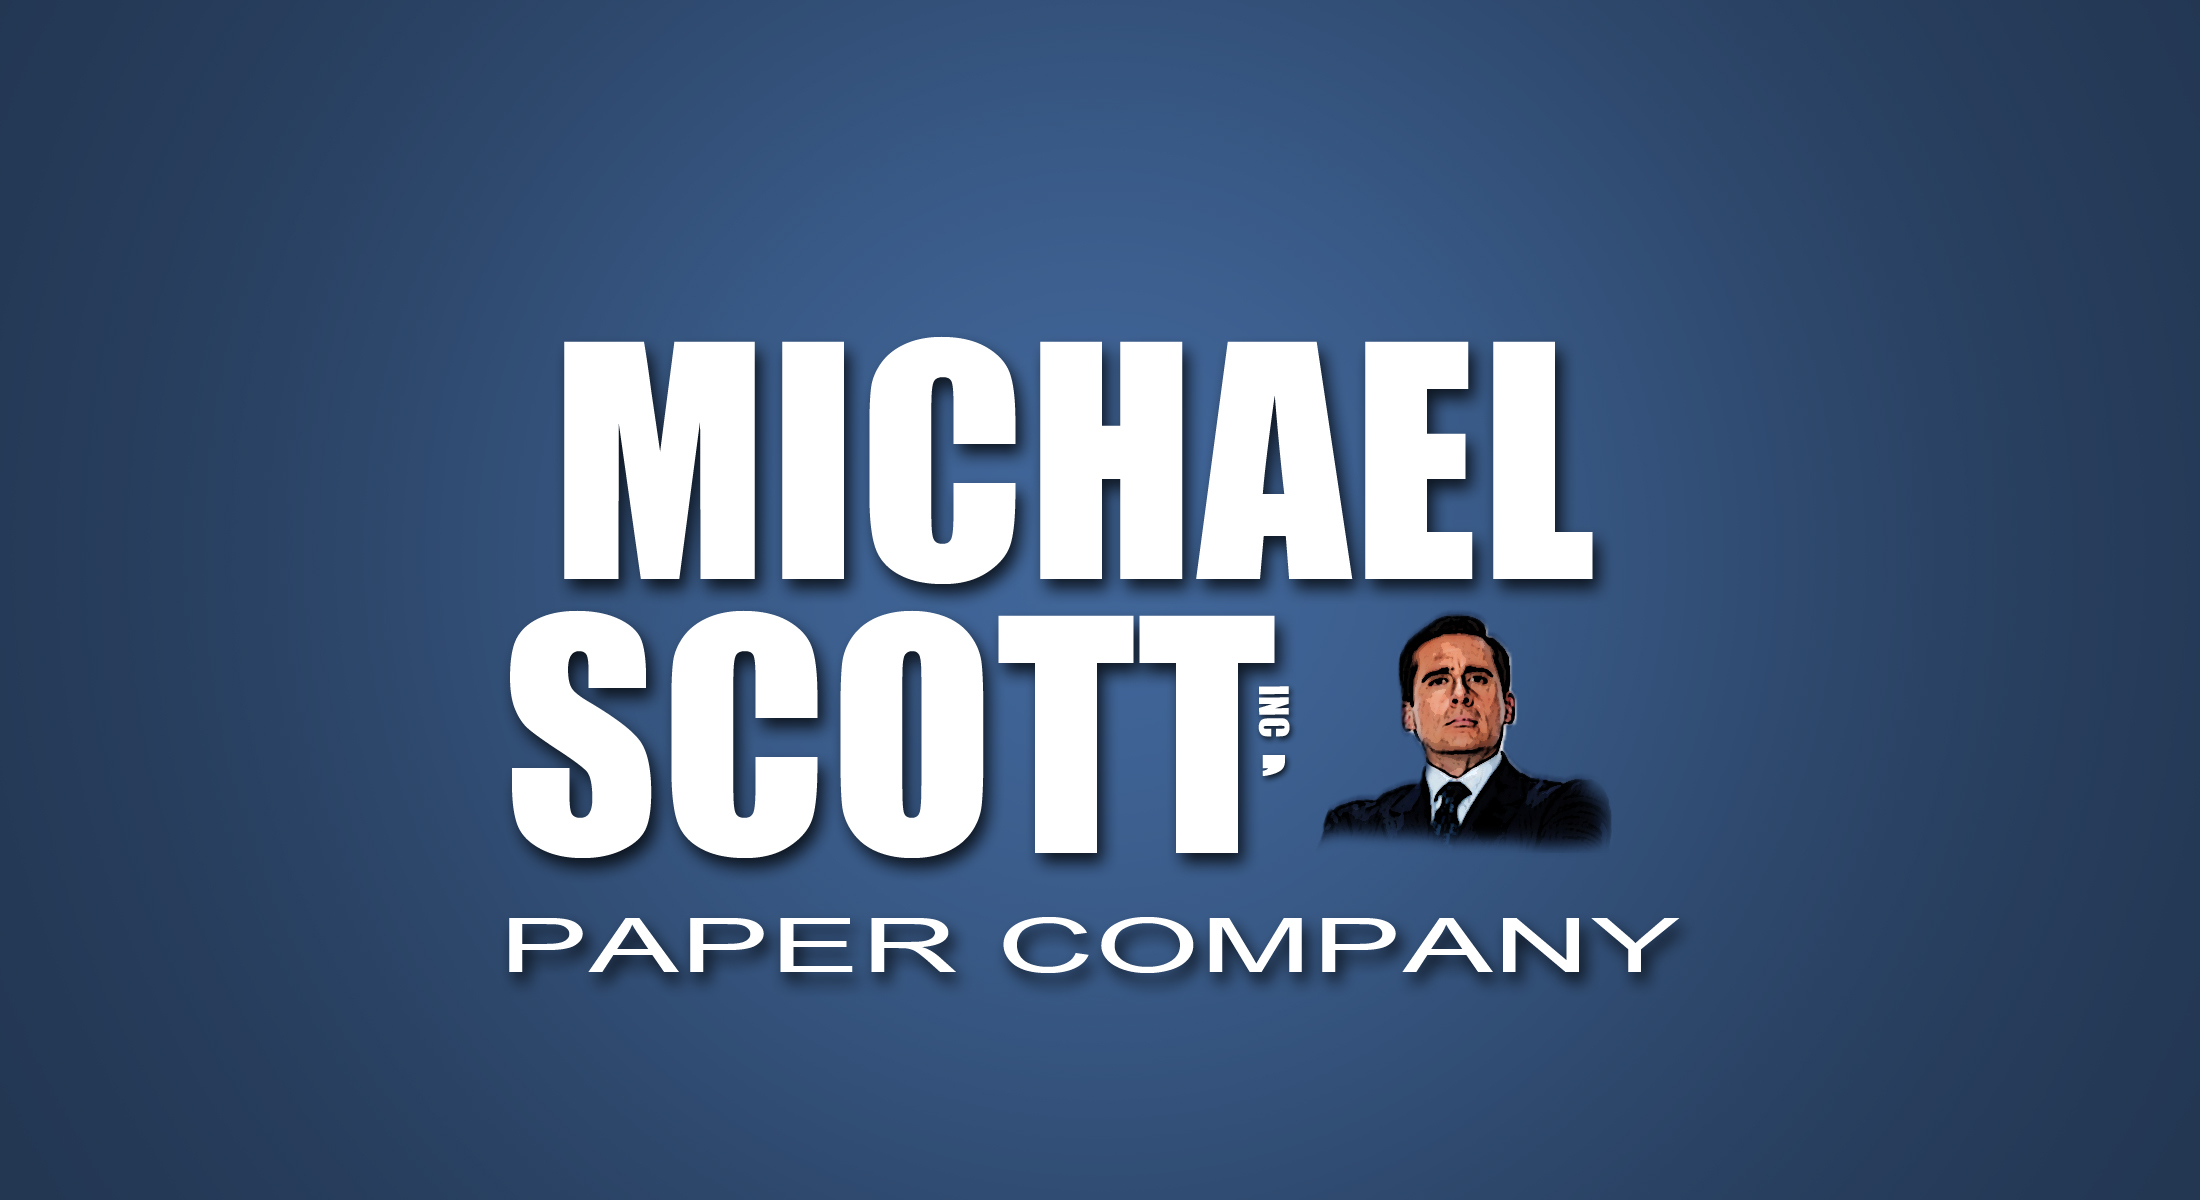 Michael scott paper company by lifeendsnow on deviantart - Michael scott wallpaper ...